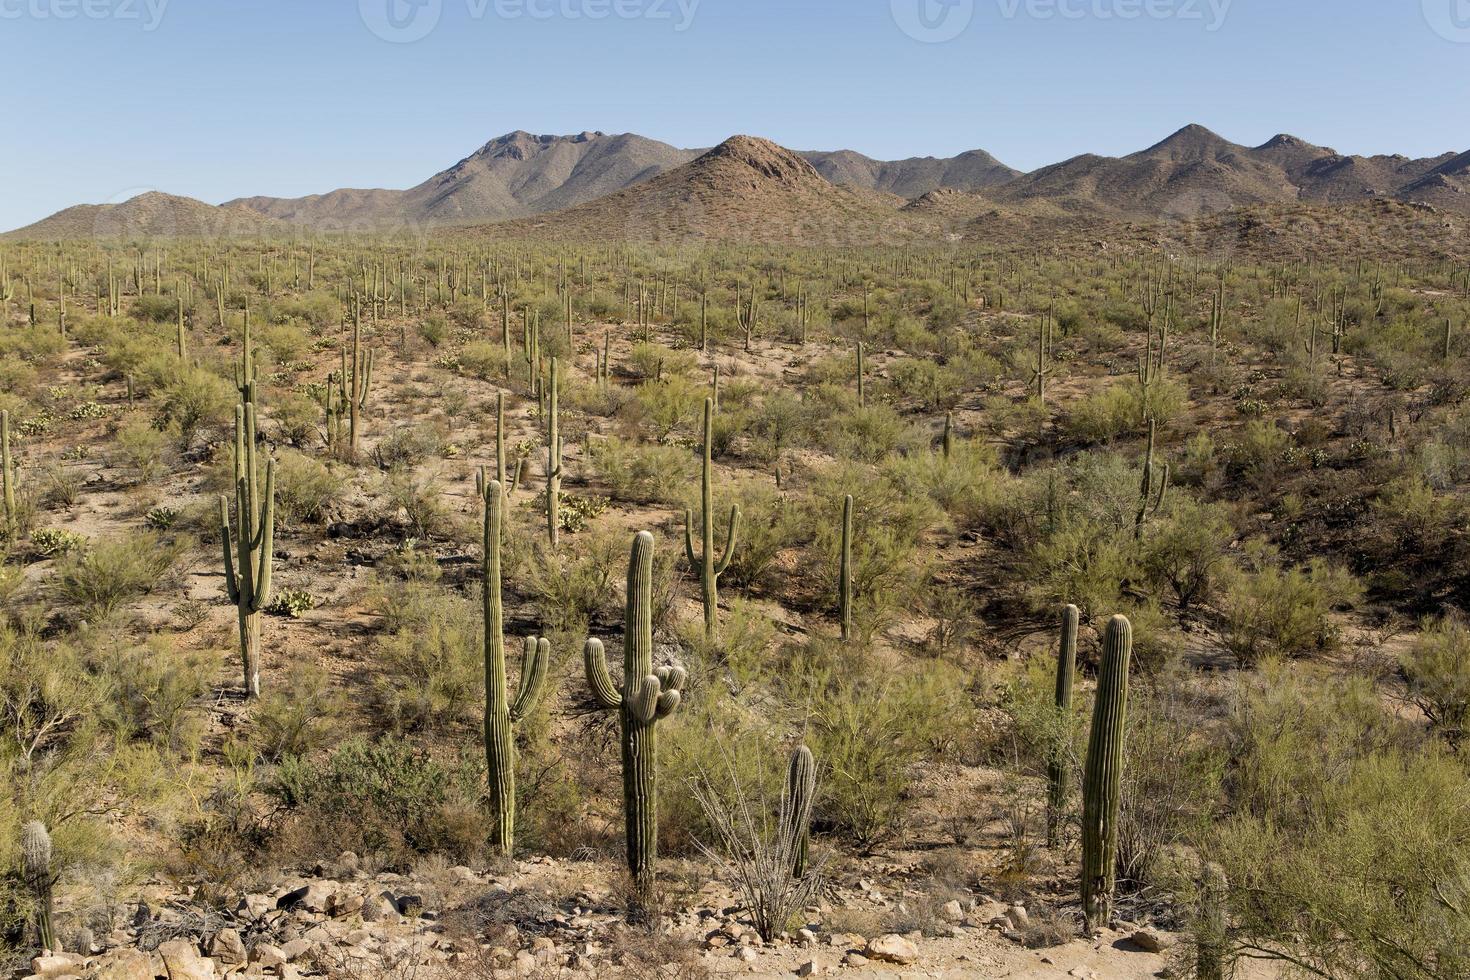 Wüste mit Saguaro-Kaktus foto